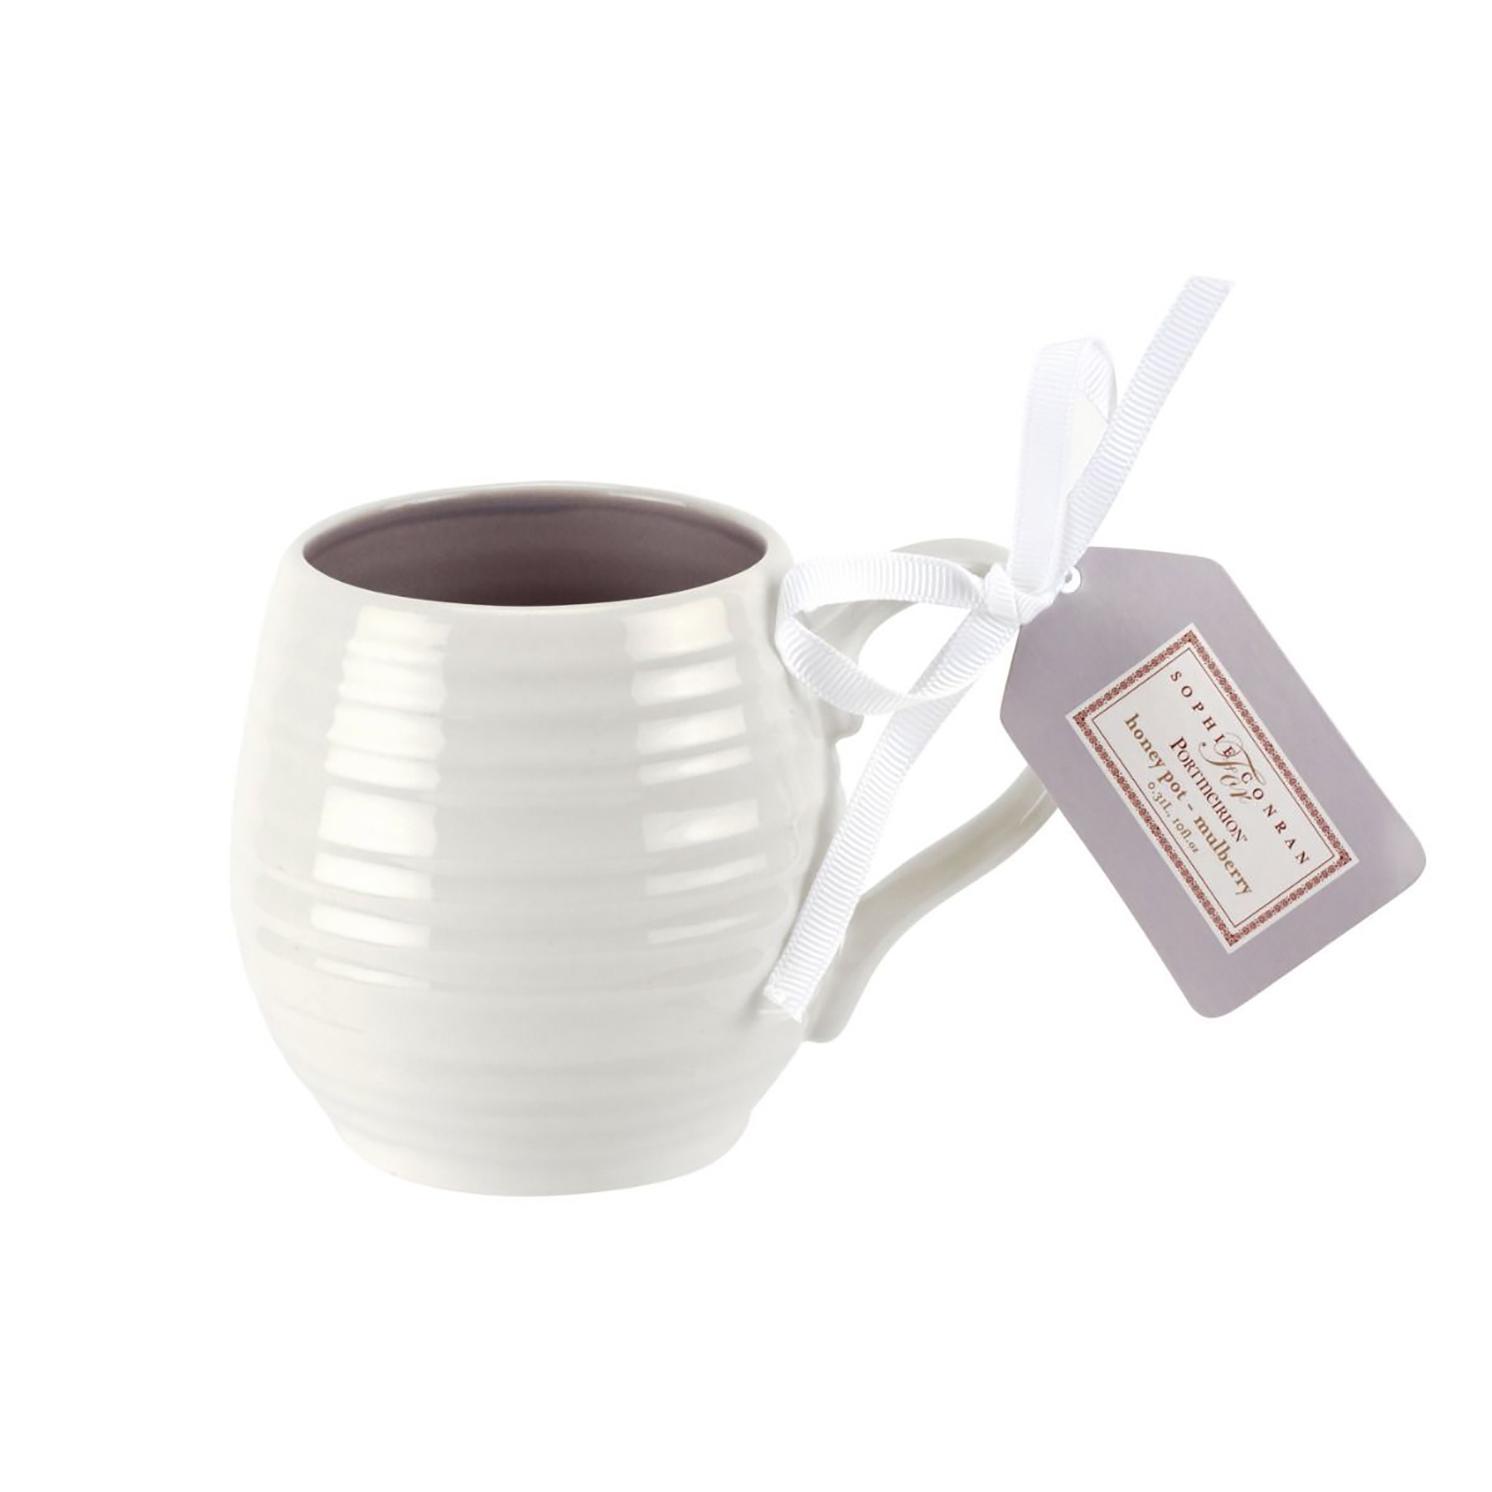 Sophie Conran for Portmeirion – Set of 4 Honey Pot Mulberry Barrel Mugs in Box